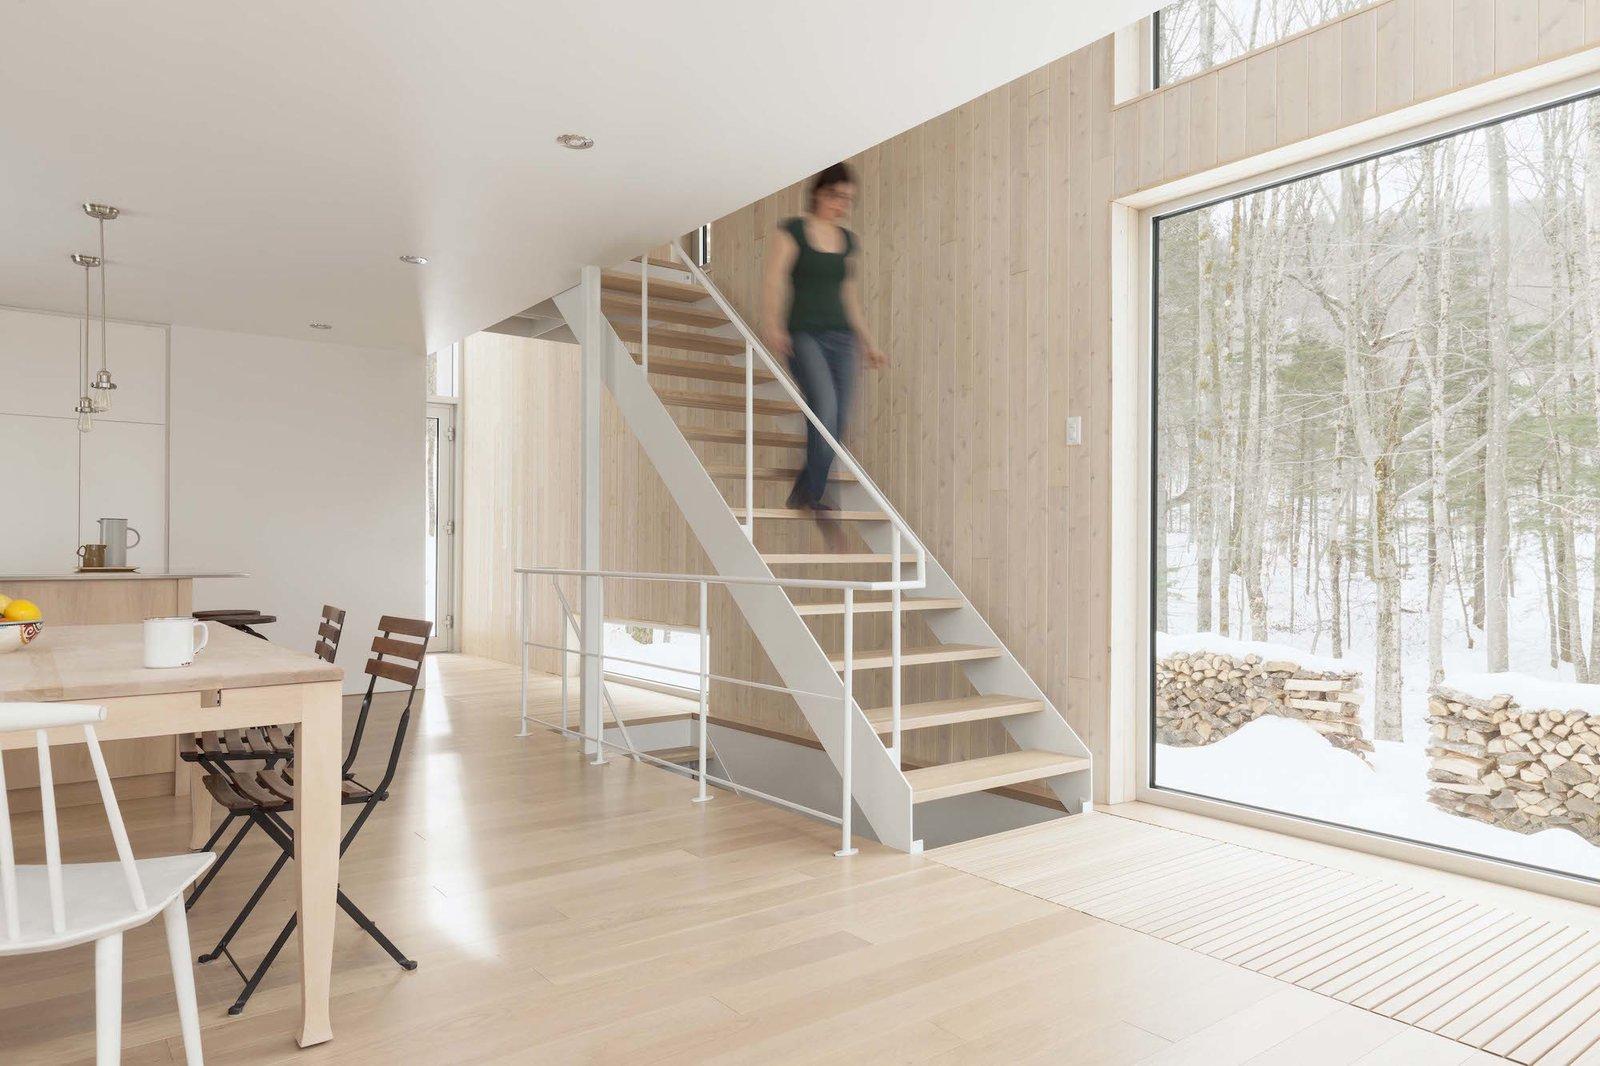 Photo 4 of 5 in La Maison Haute by Atelier Pierre Thibault